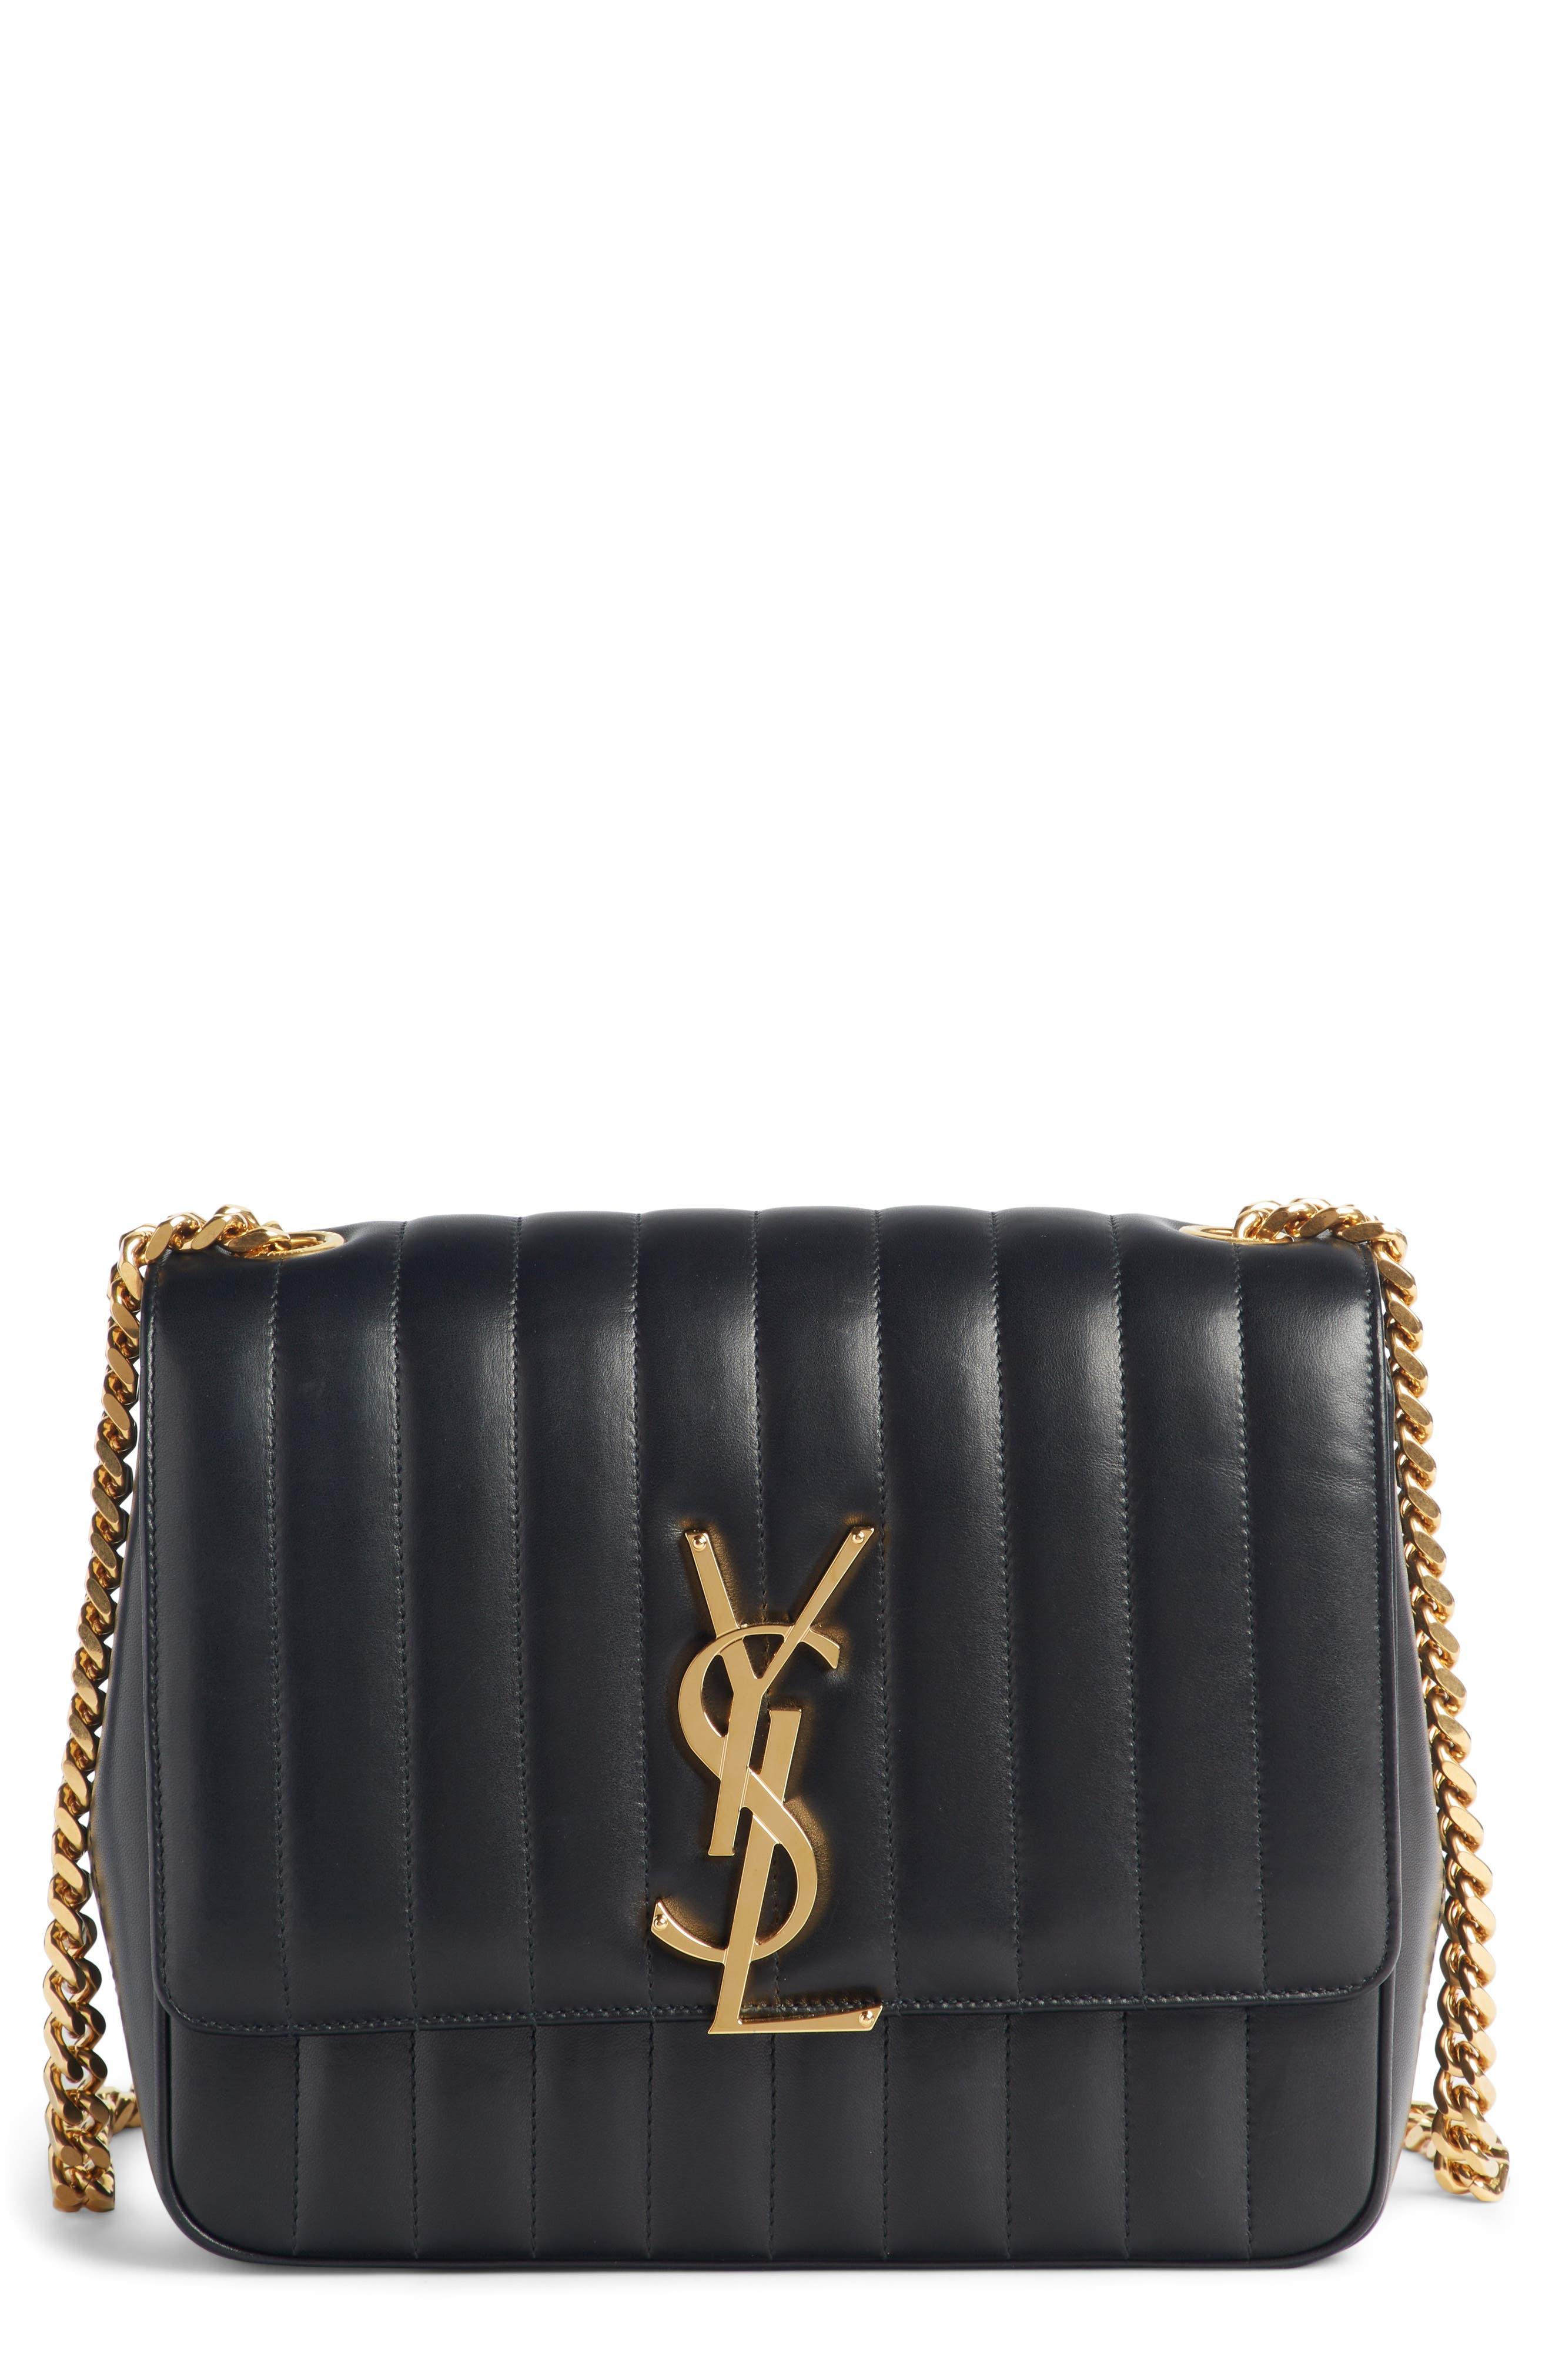 Large Vicky Leather Crossbody Bag,                             Main thumbnail 1, color,                             NOIR